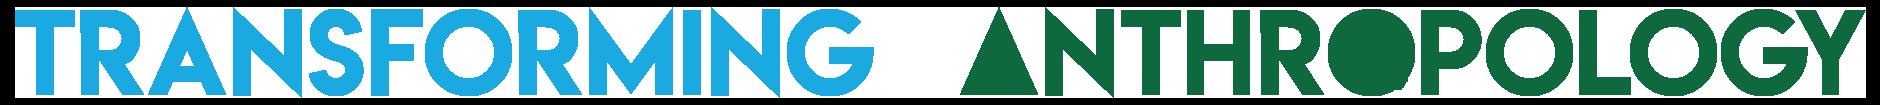 TA letter logo.png